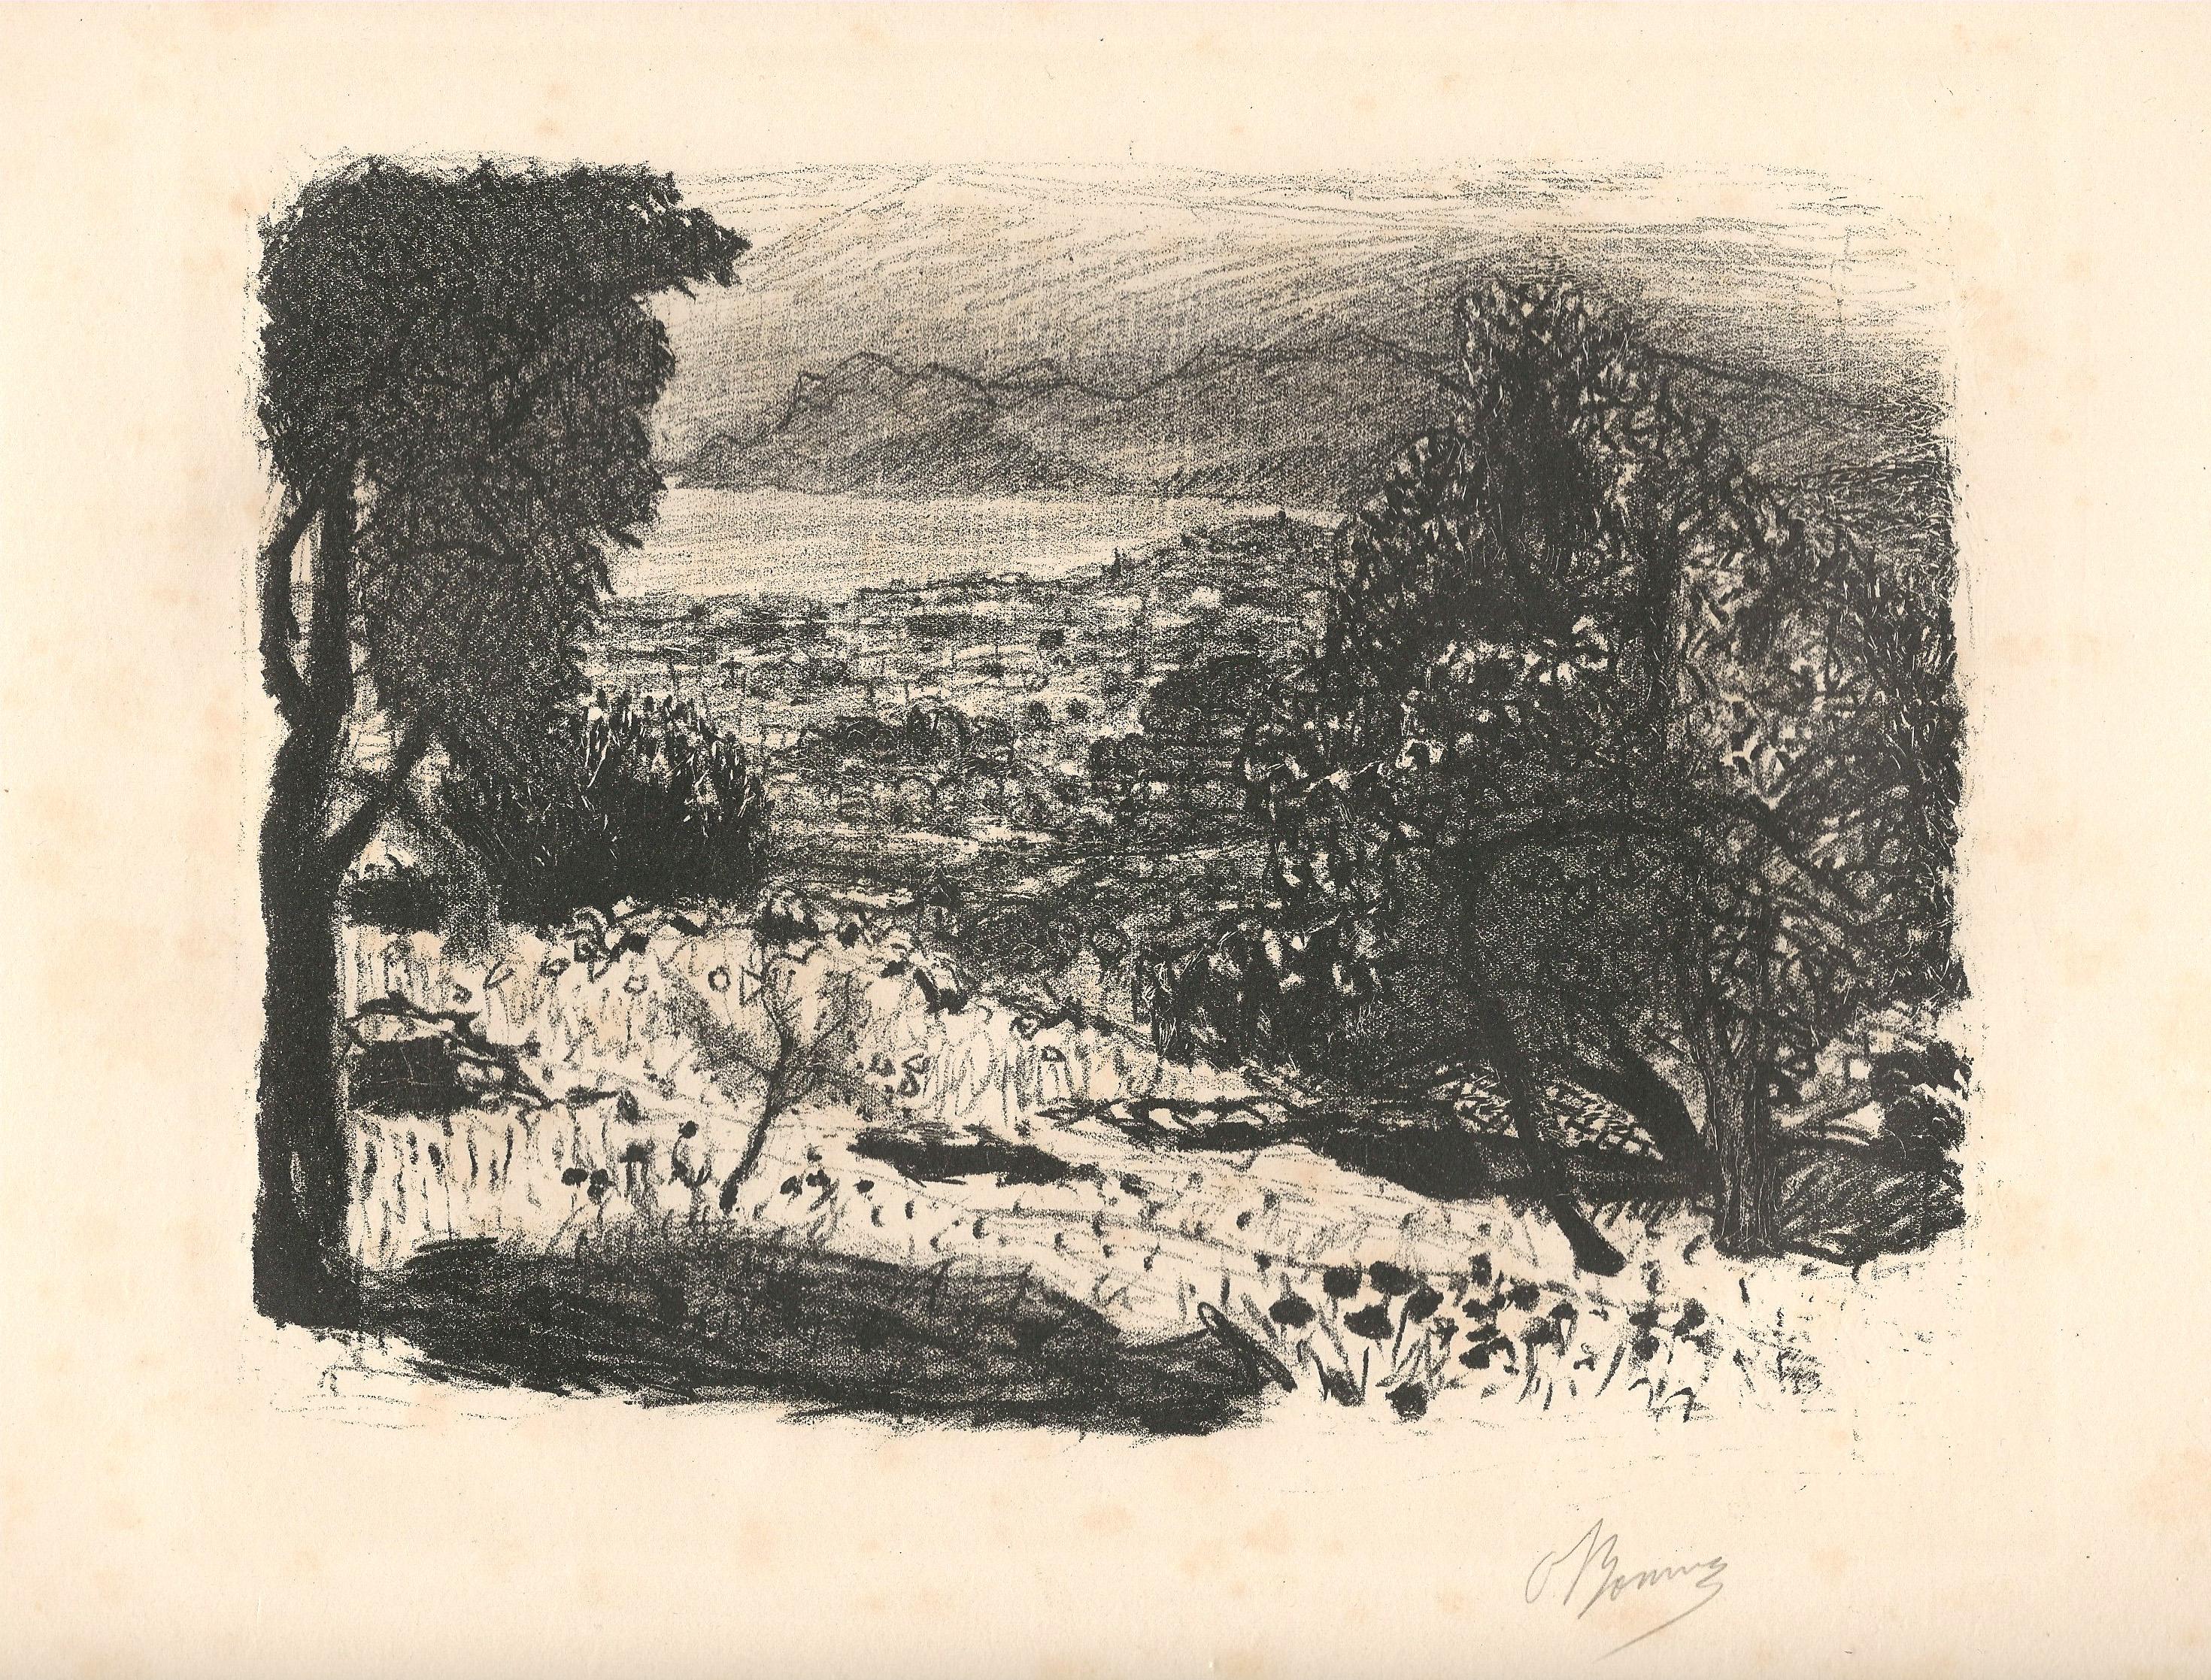 Pierre BONNARD (Francia, 1867 – 1947) – PAYSAGE DU MIDI (1925)